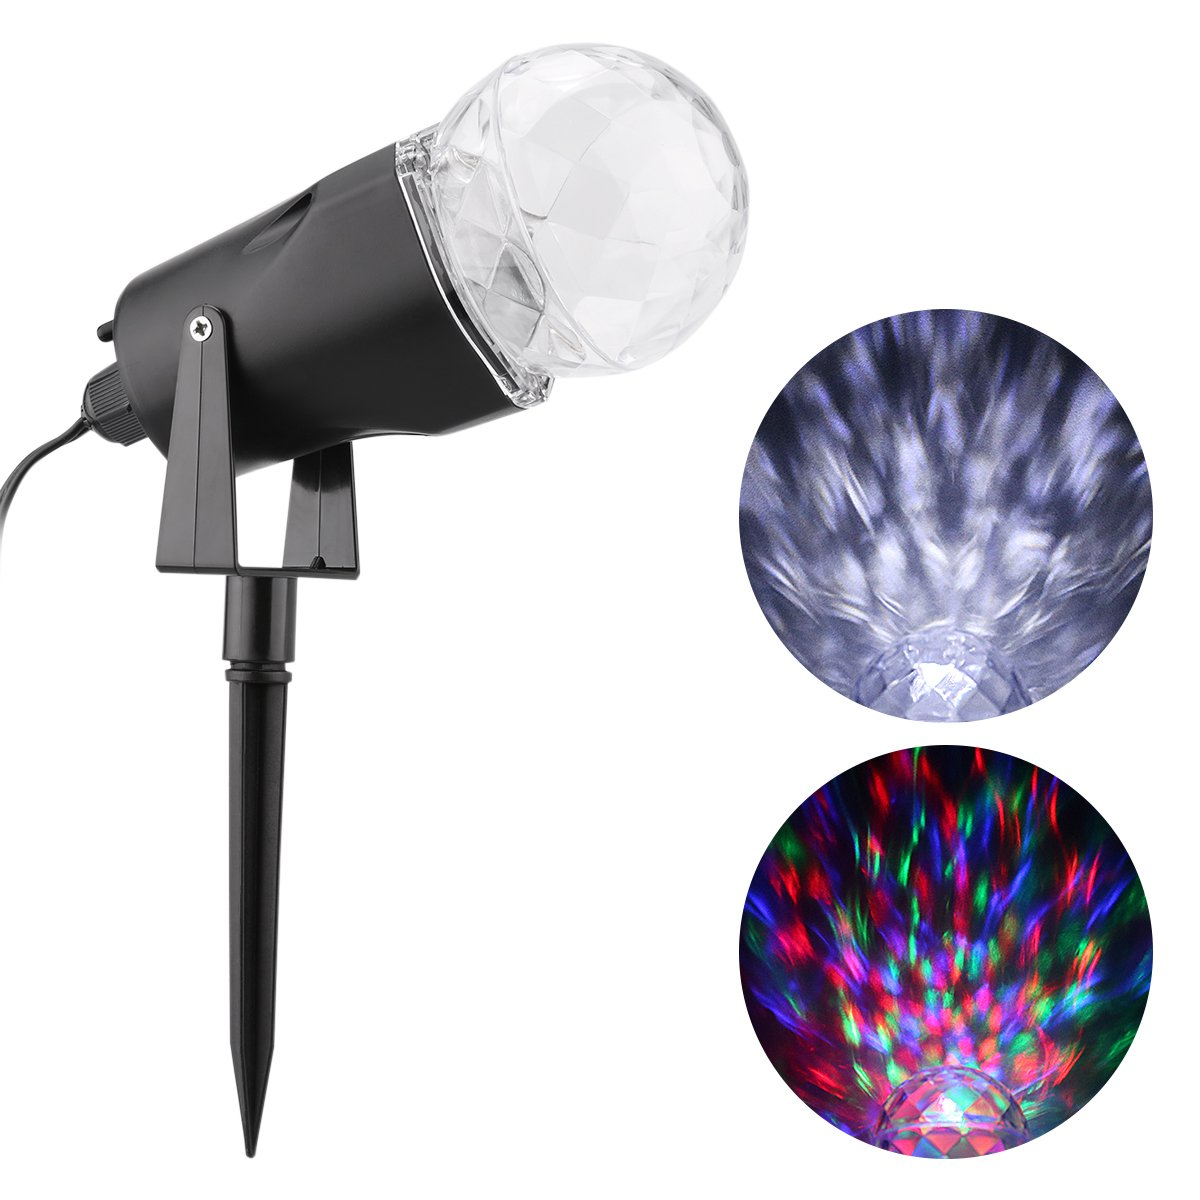 Amazon.com: Excelvan Kaleidoscope Spotlight Rotating Led Light RBG ...